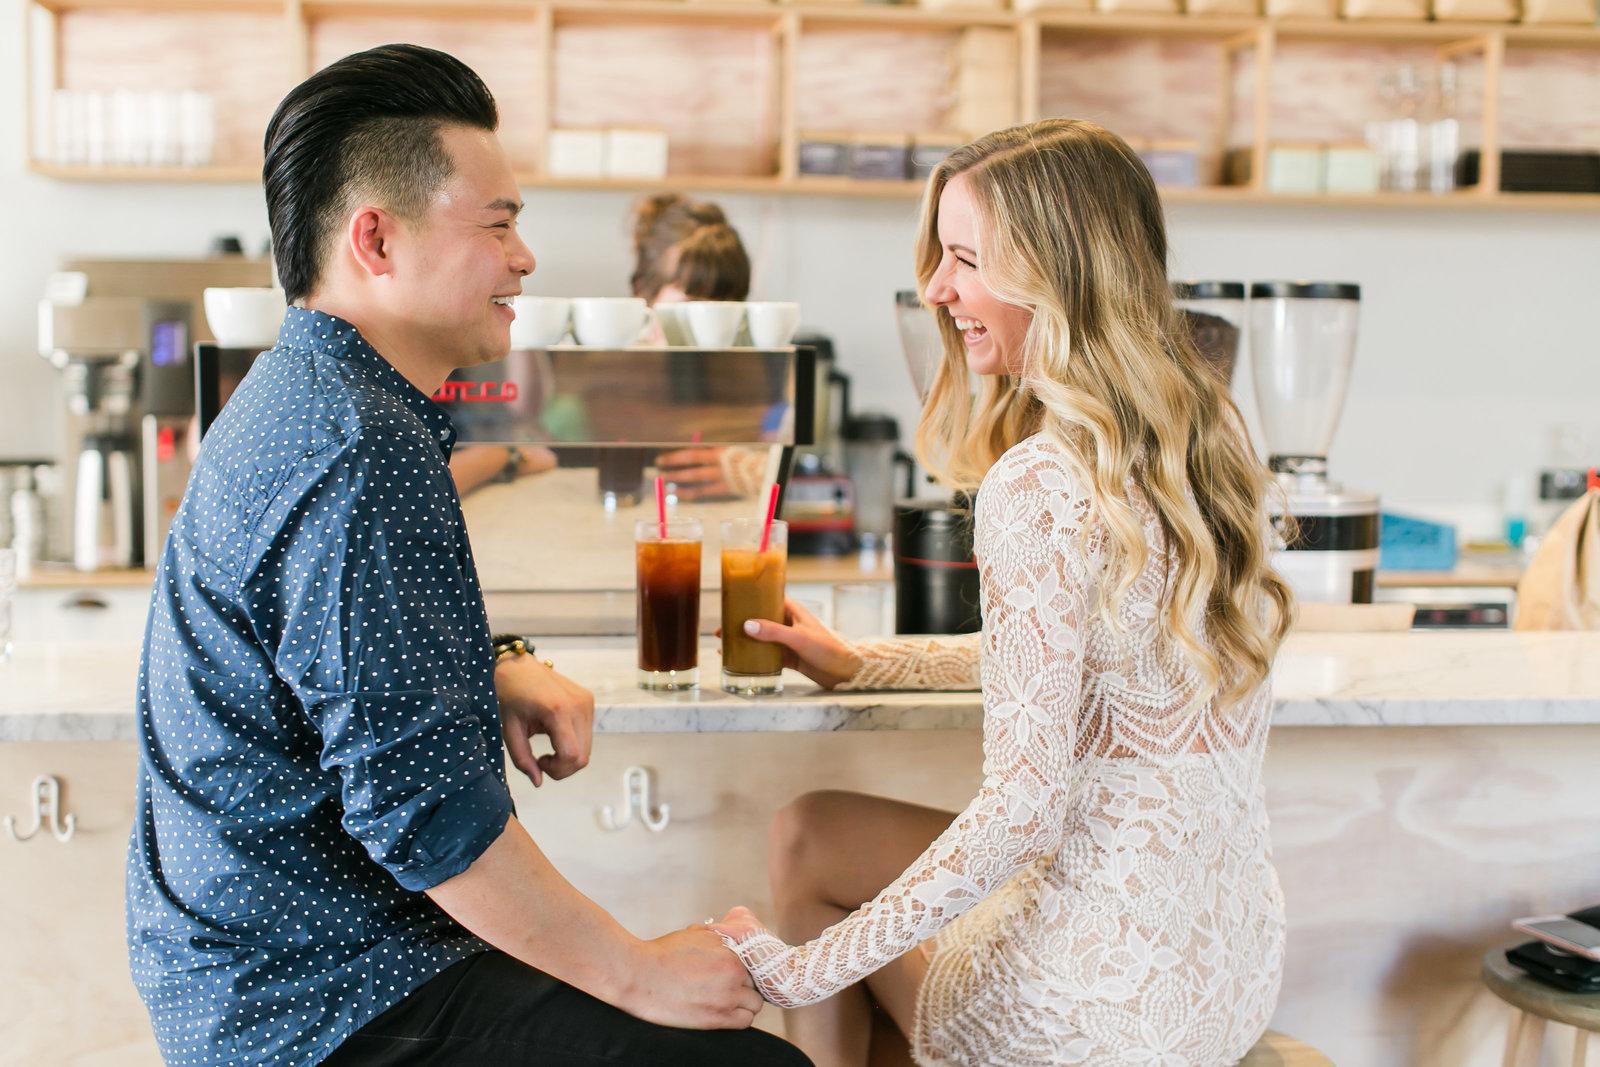 Liza-Jimmy-engagement-photos455426